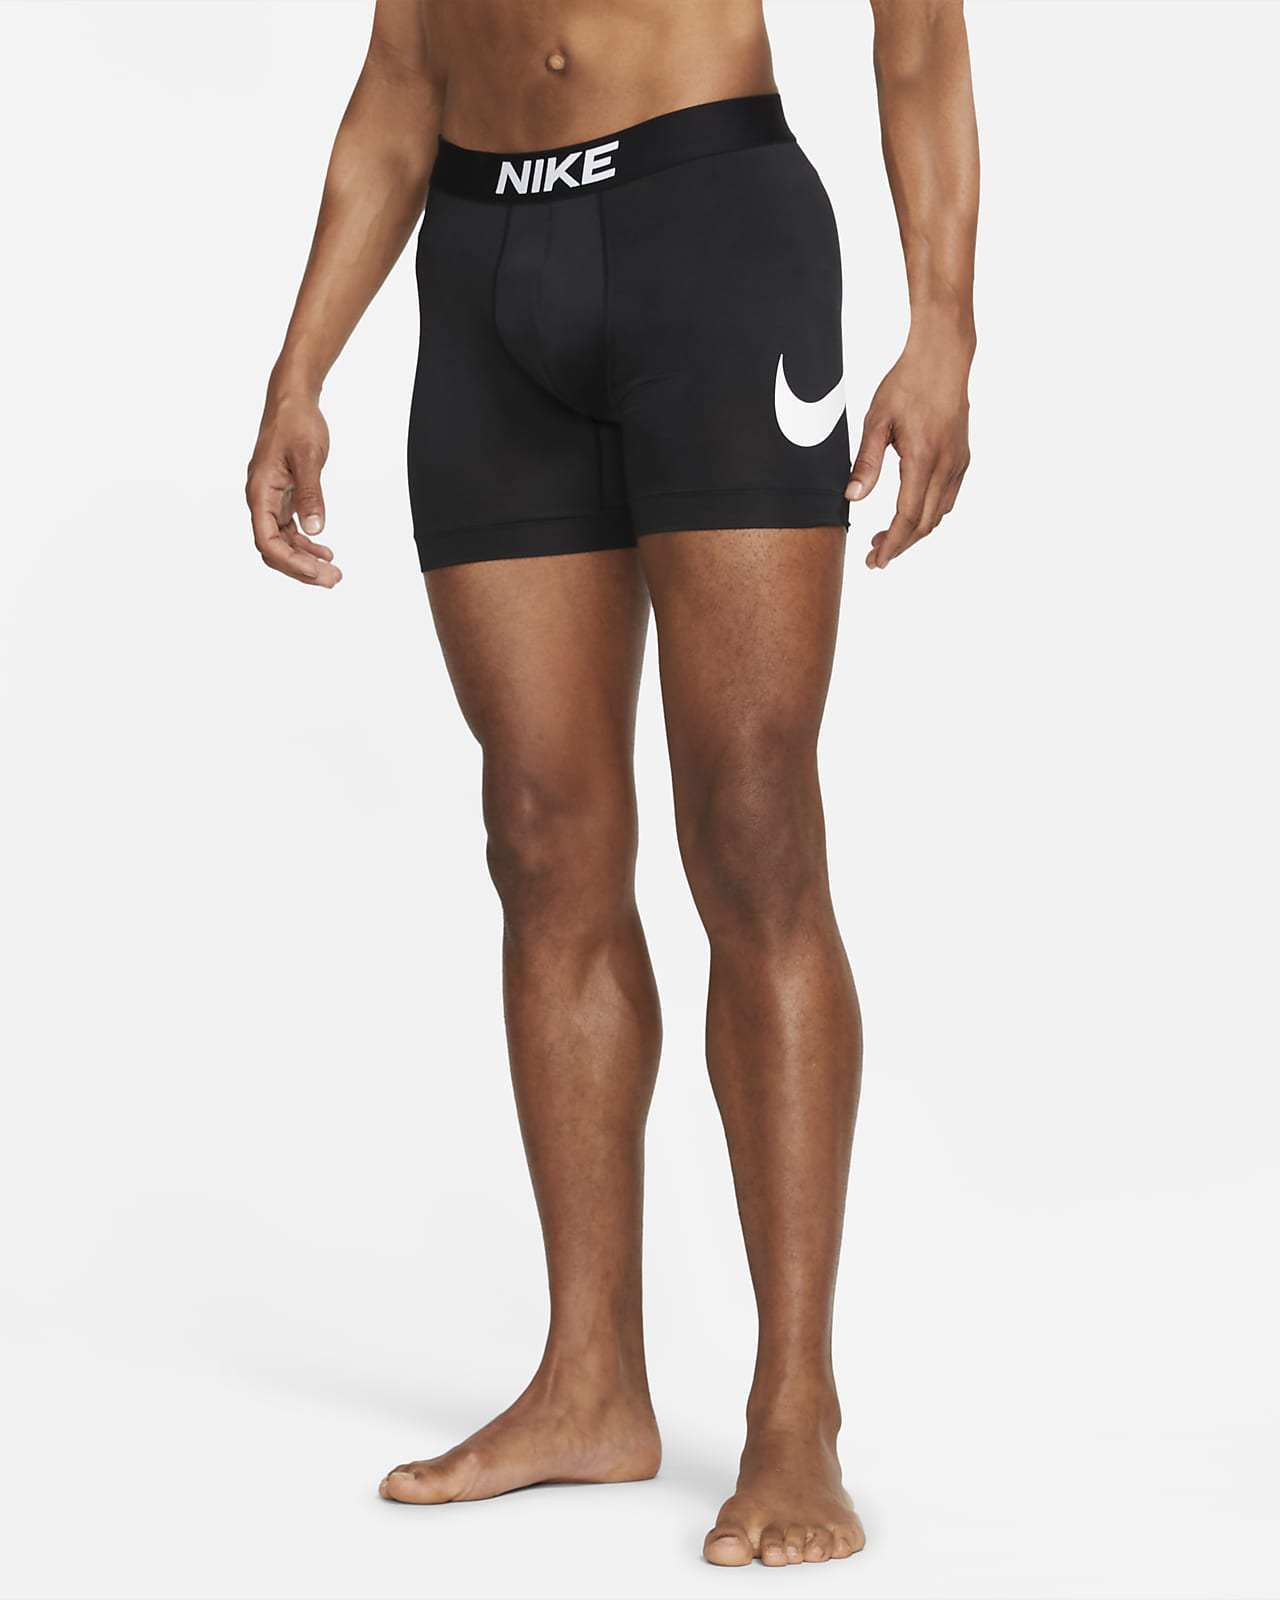 Ropa interior para hombre Nike Essential Micro